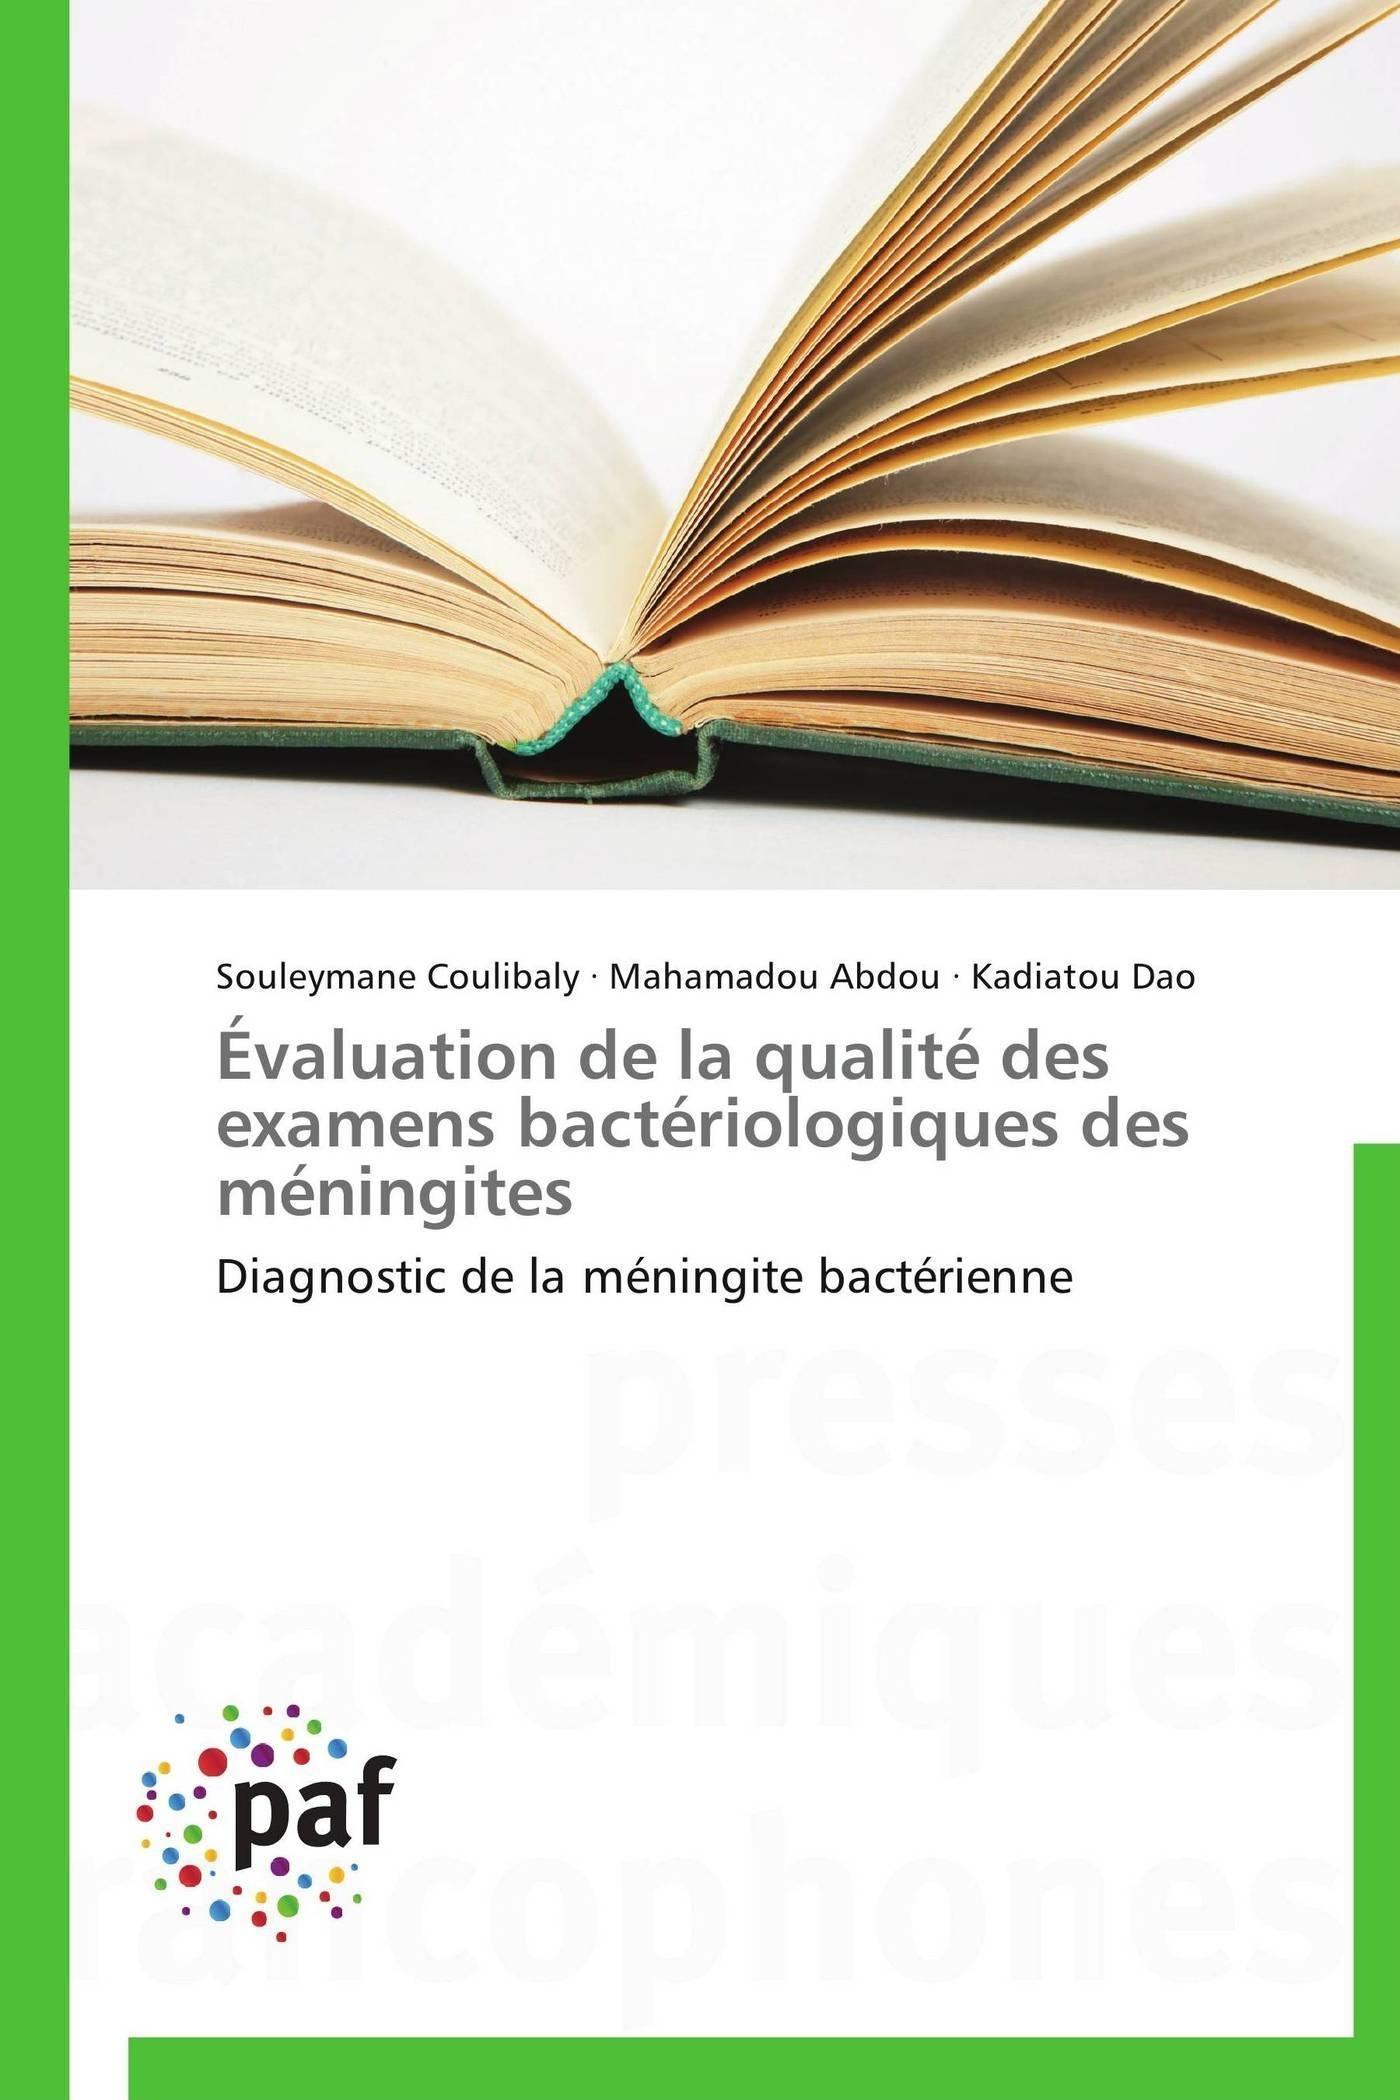 EVALUATION DE LA QUALITE DES EXAMENS BACTERIOLOGIQUES DES MENINGITES